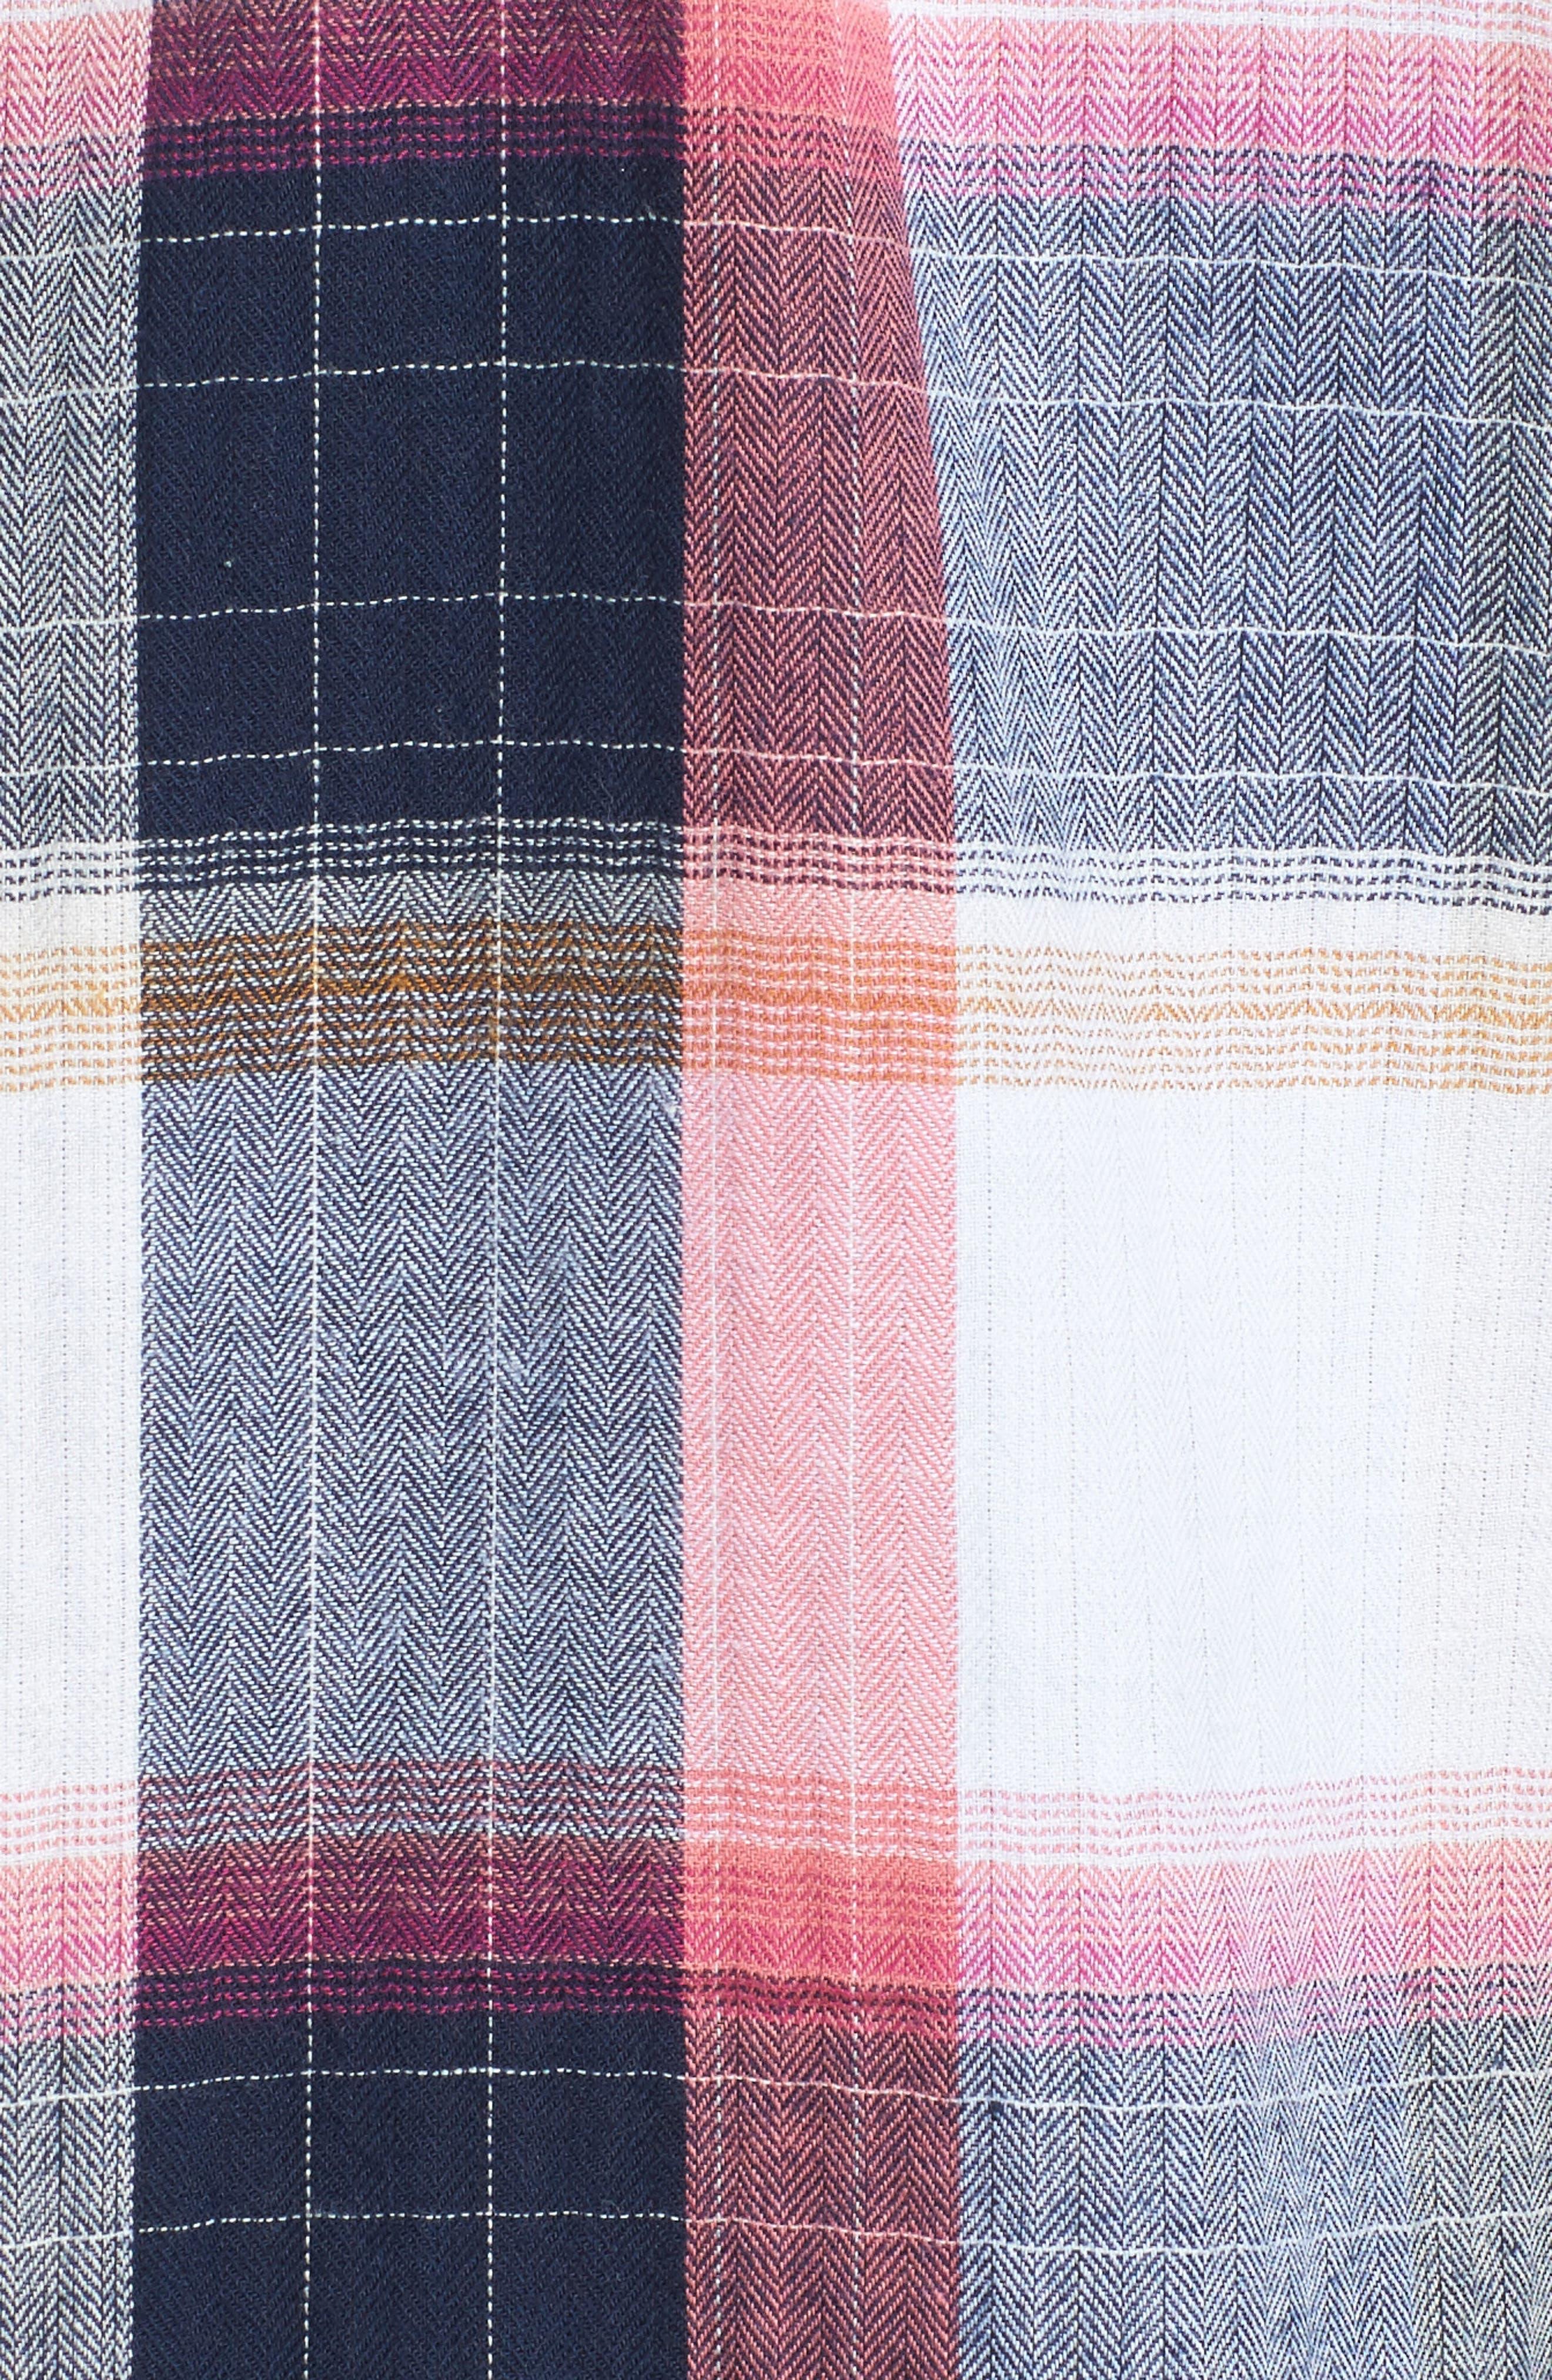 Peplum Plaid Shirt,                             Alternate thumbnail 5, color,                             Navy- Rose Plaid